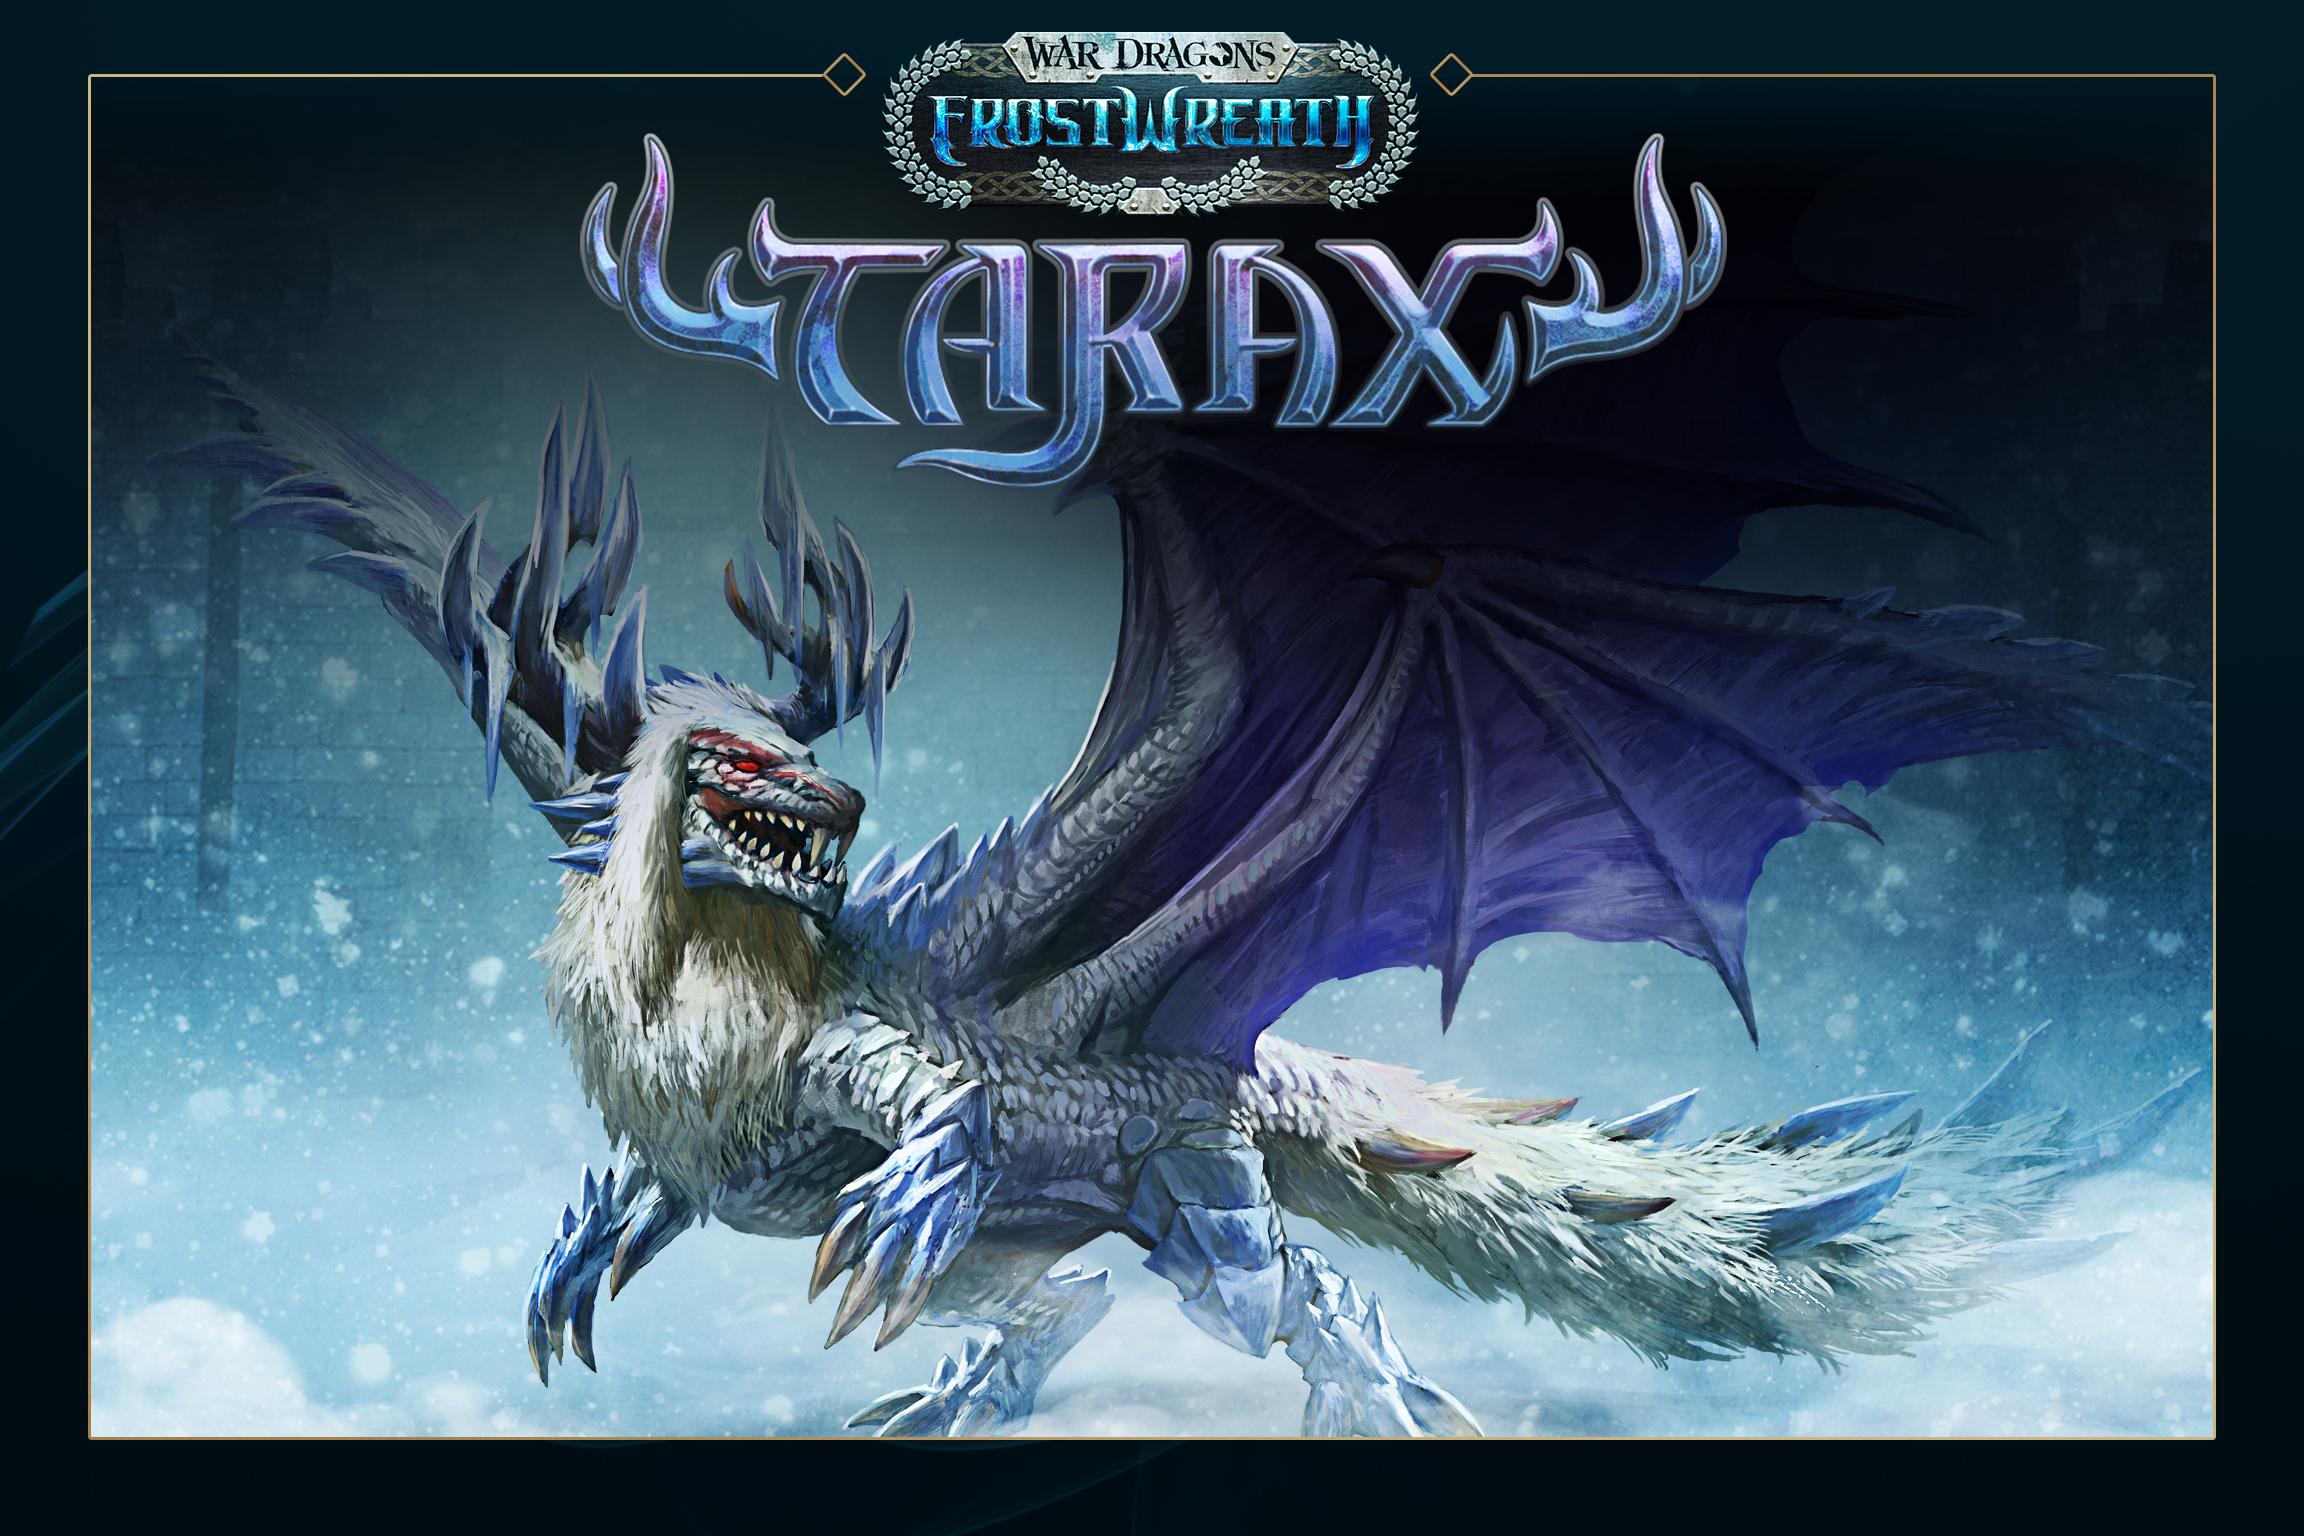 War Dragons - Master of Winter